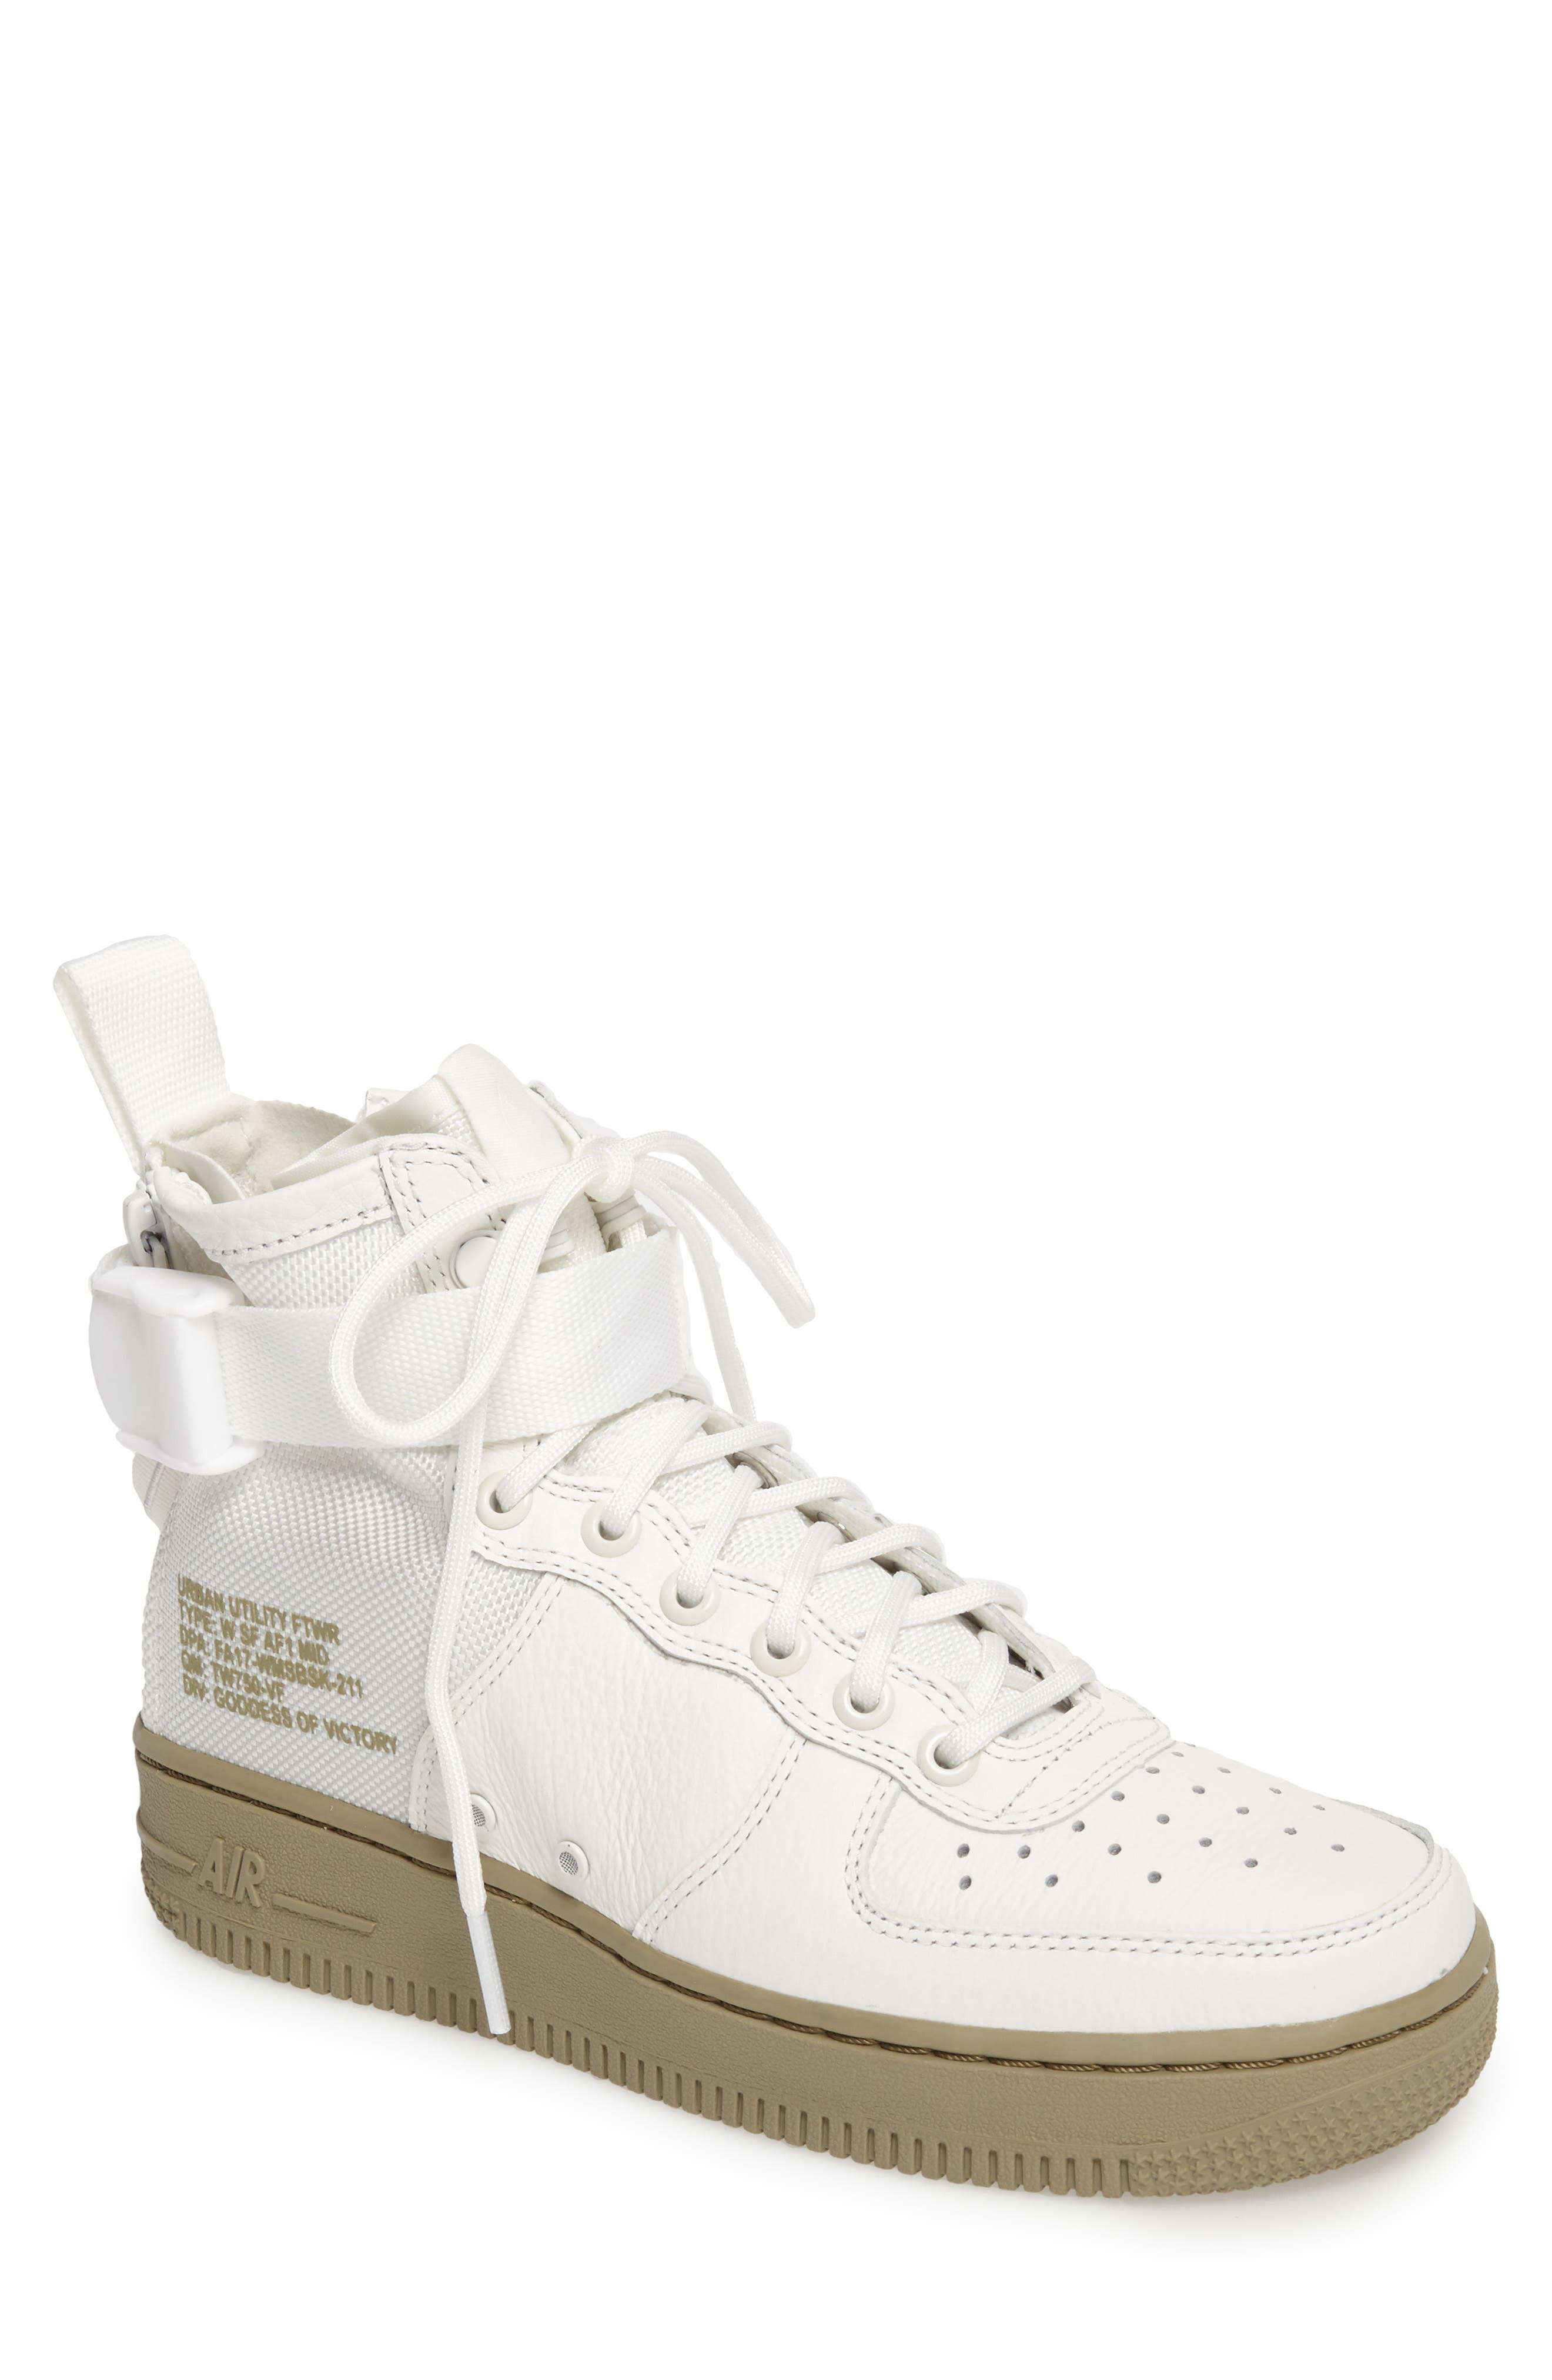 Main Image - Nike SF Air Force 1 Mid Sneaker (Women)